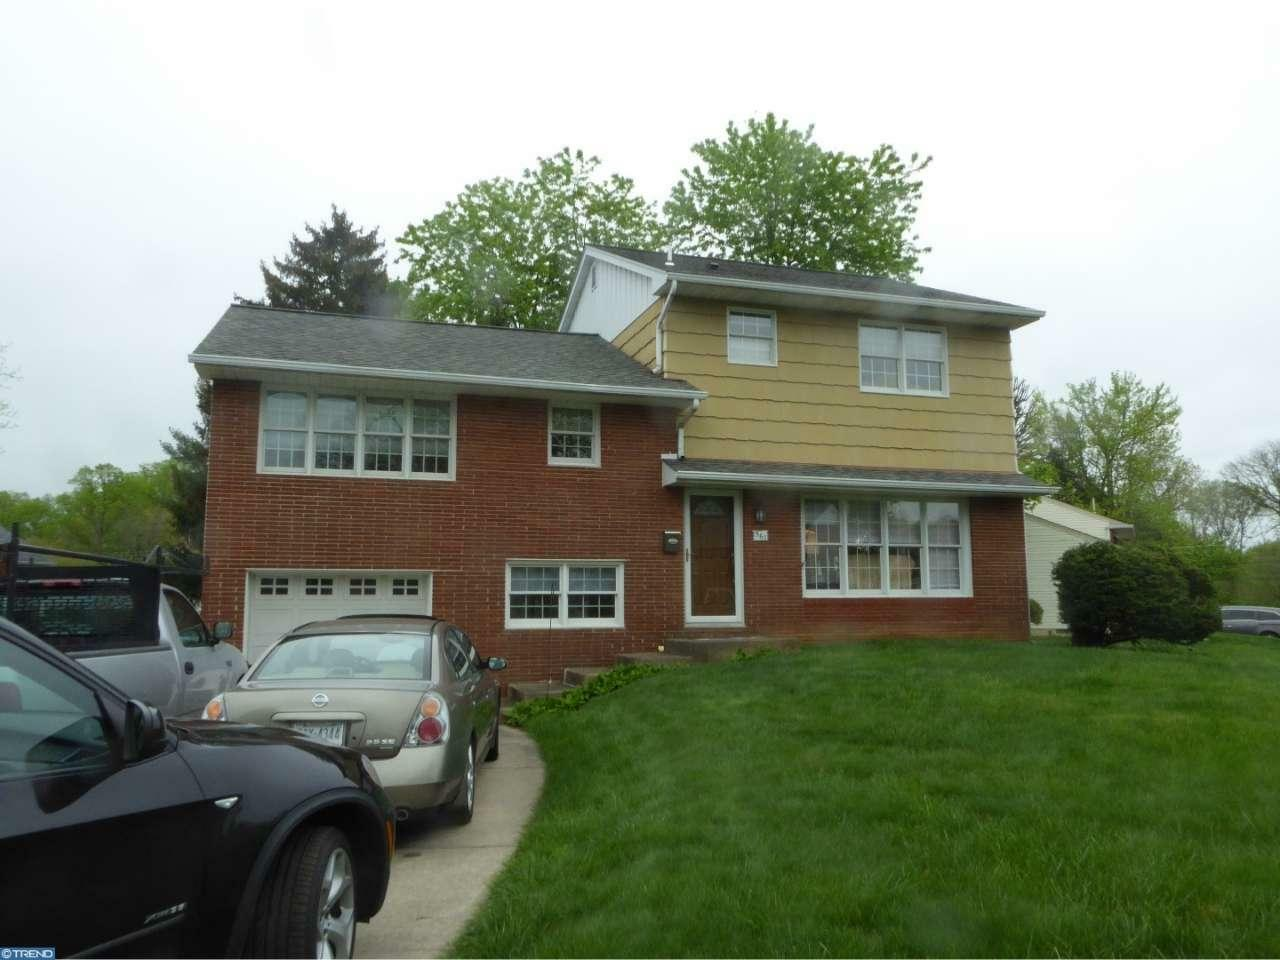 561 Clarissa Ln, Penndel, PA - USA (photo 1)